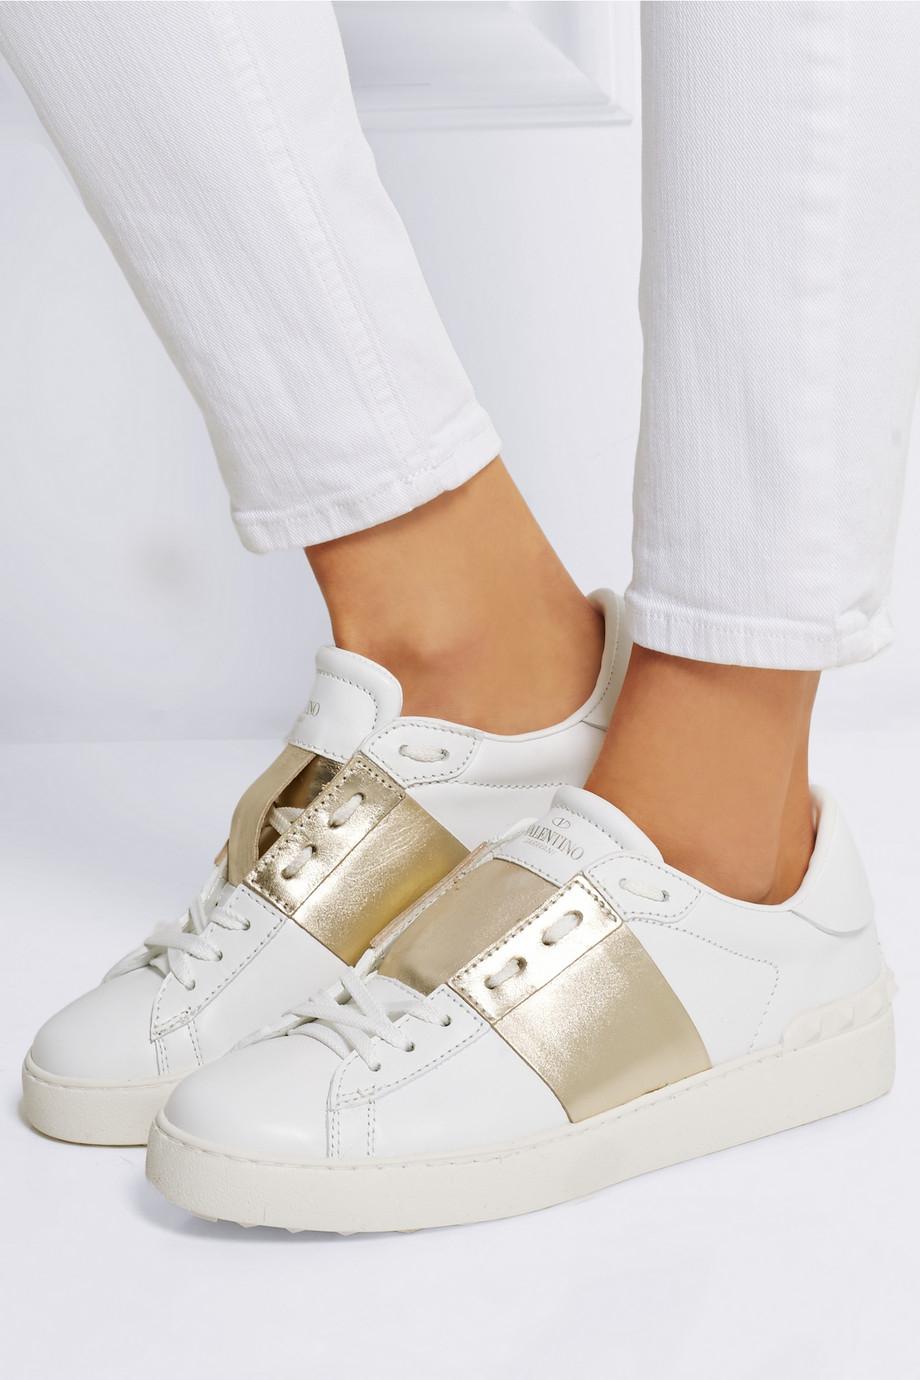 6384270329eb Lyst - Valentino Metallic-Paneled Leather Sneakers in White VALENTINO Nylon  Rockstud Snow Boots S 35-37 White 105015